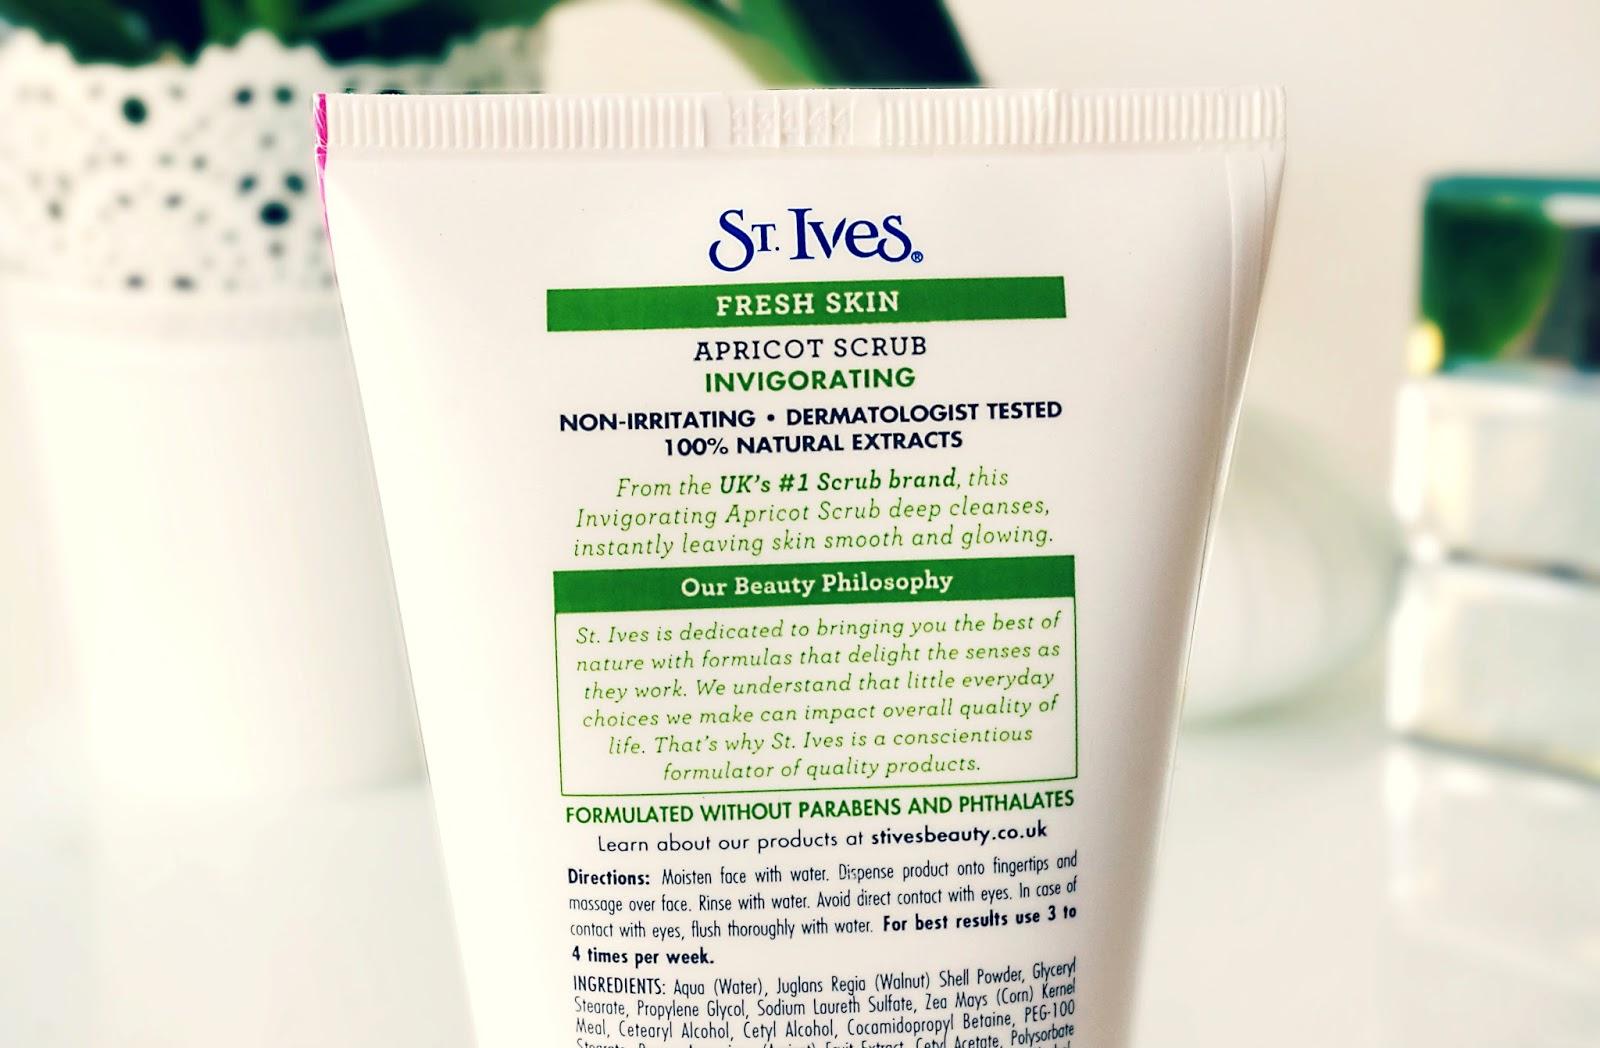 St Ives Fresh Skin Apricot Scrub Invigorating